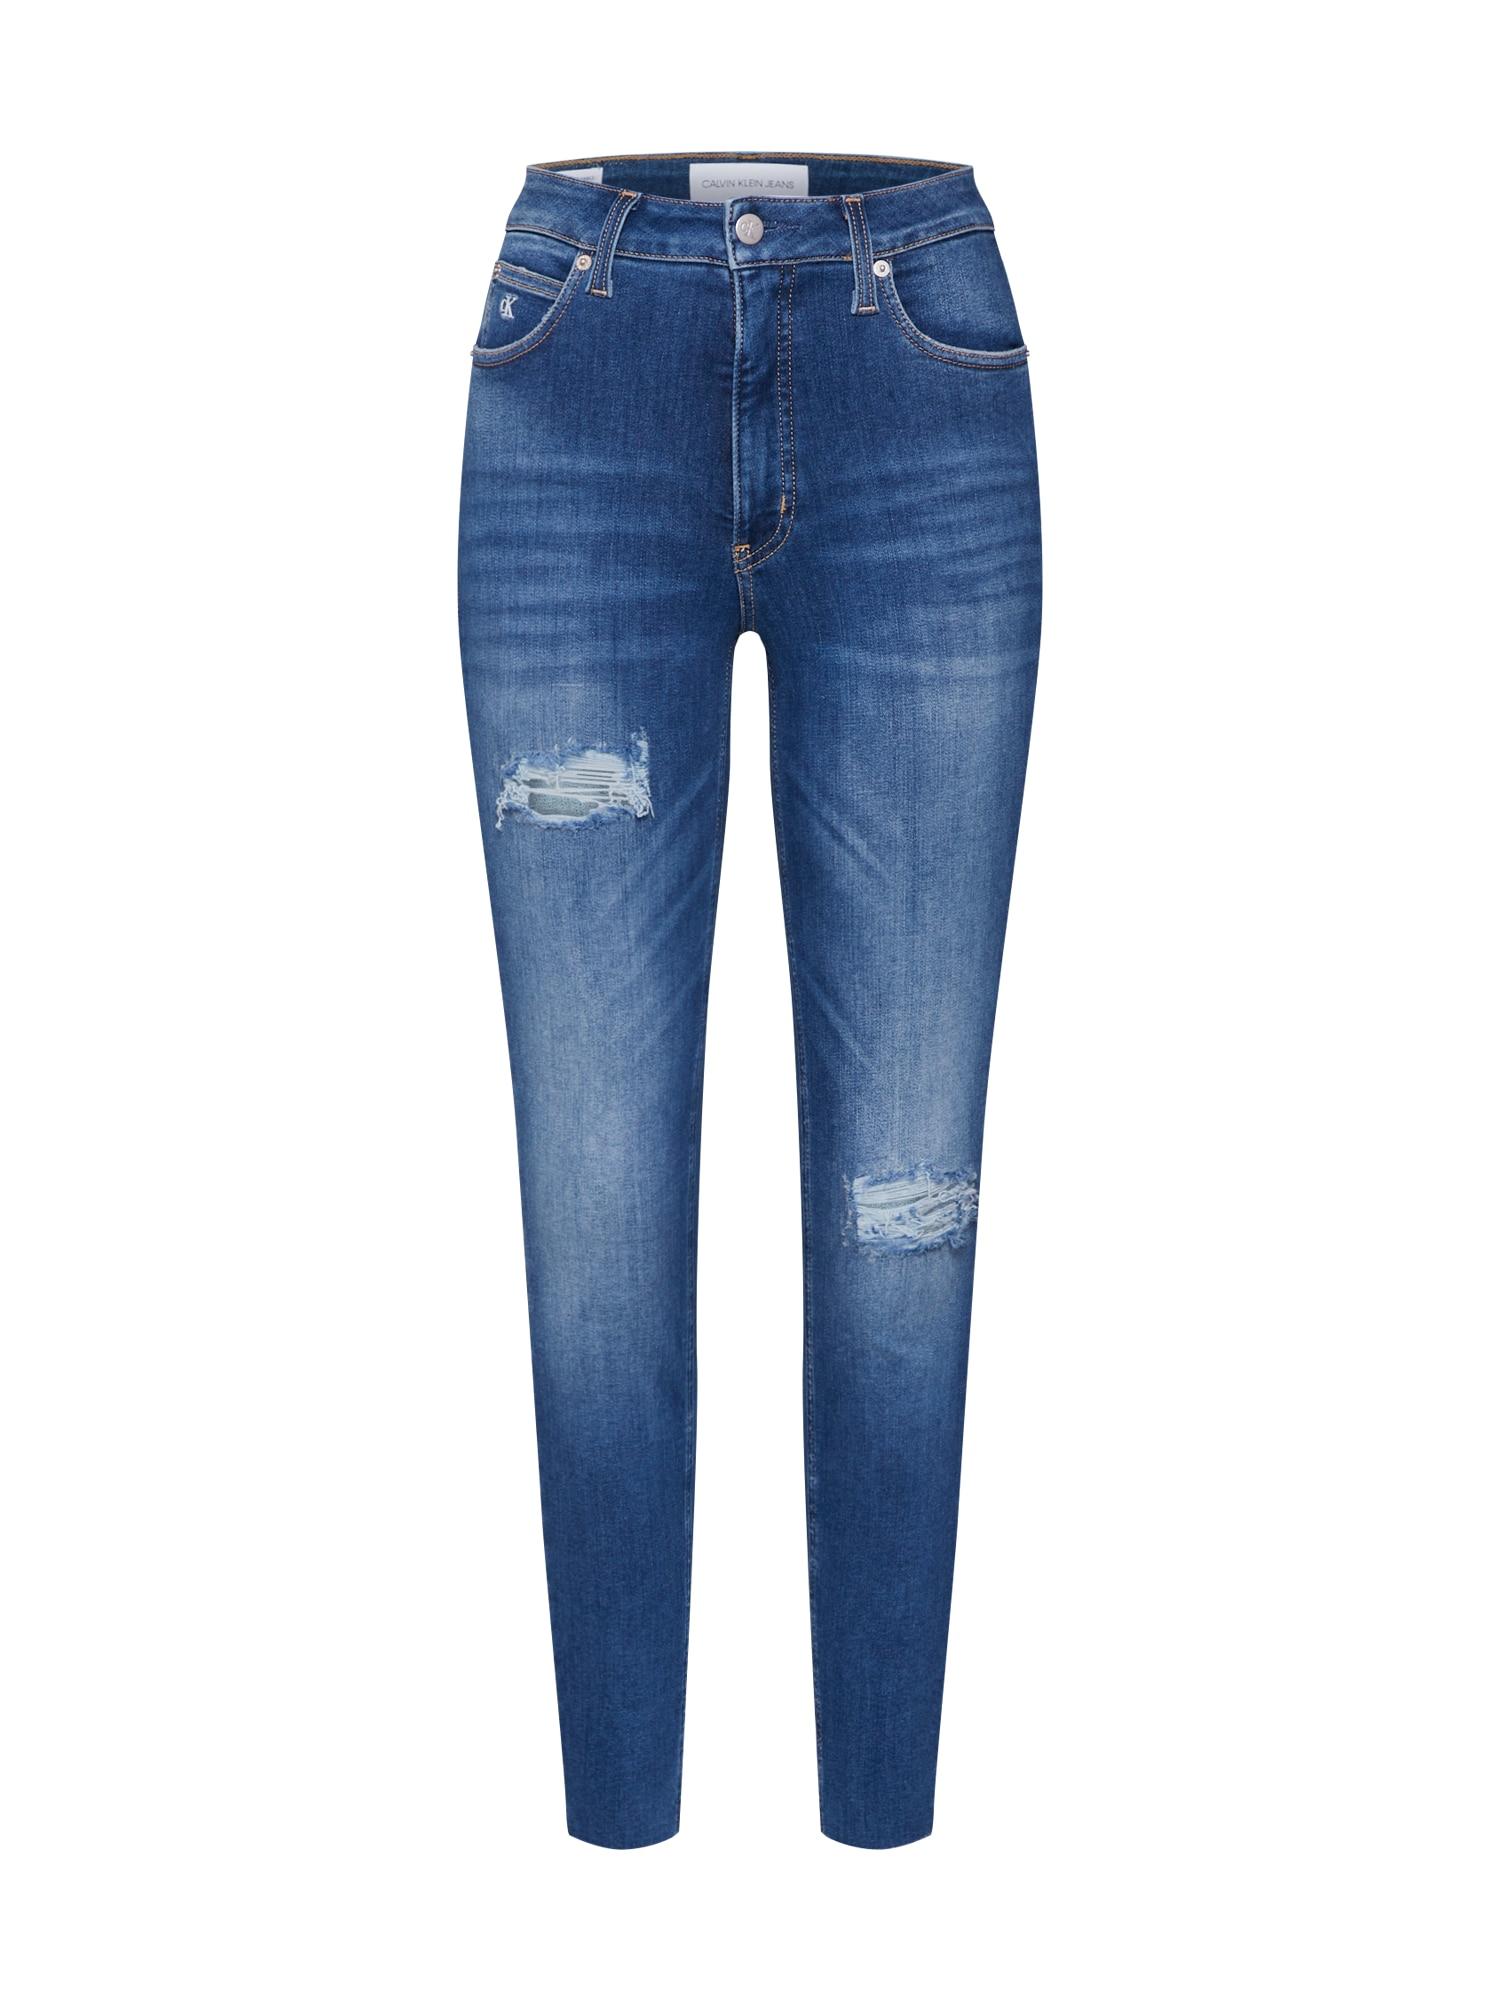 Calvin Klein Jeans Džinsai tamsiai (džinso) mėlyna